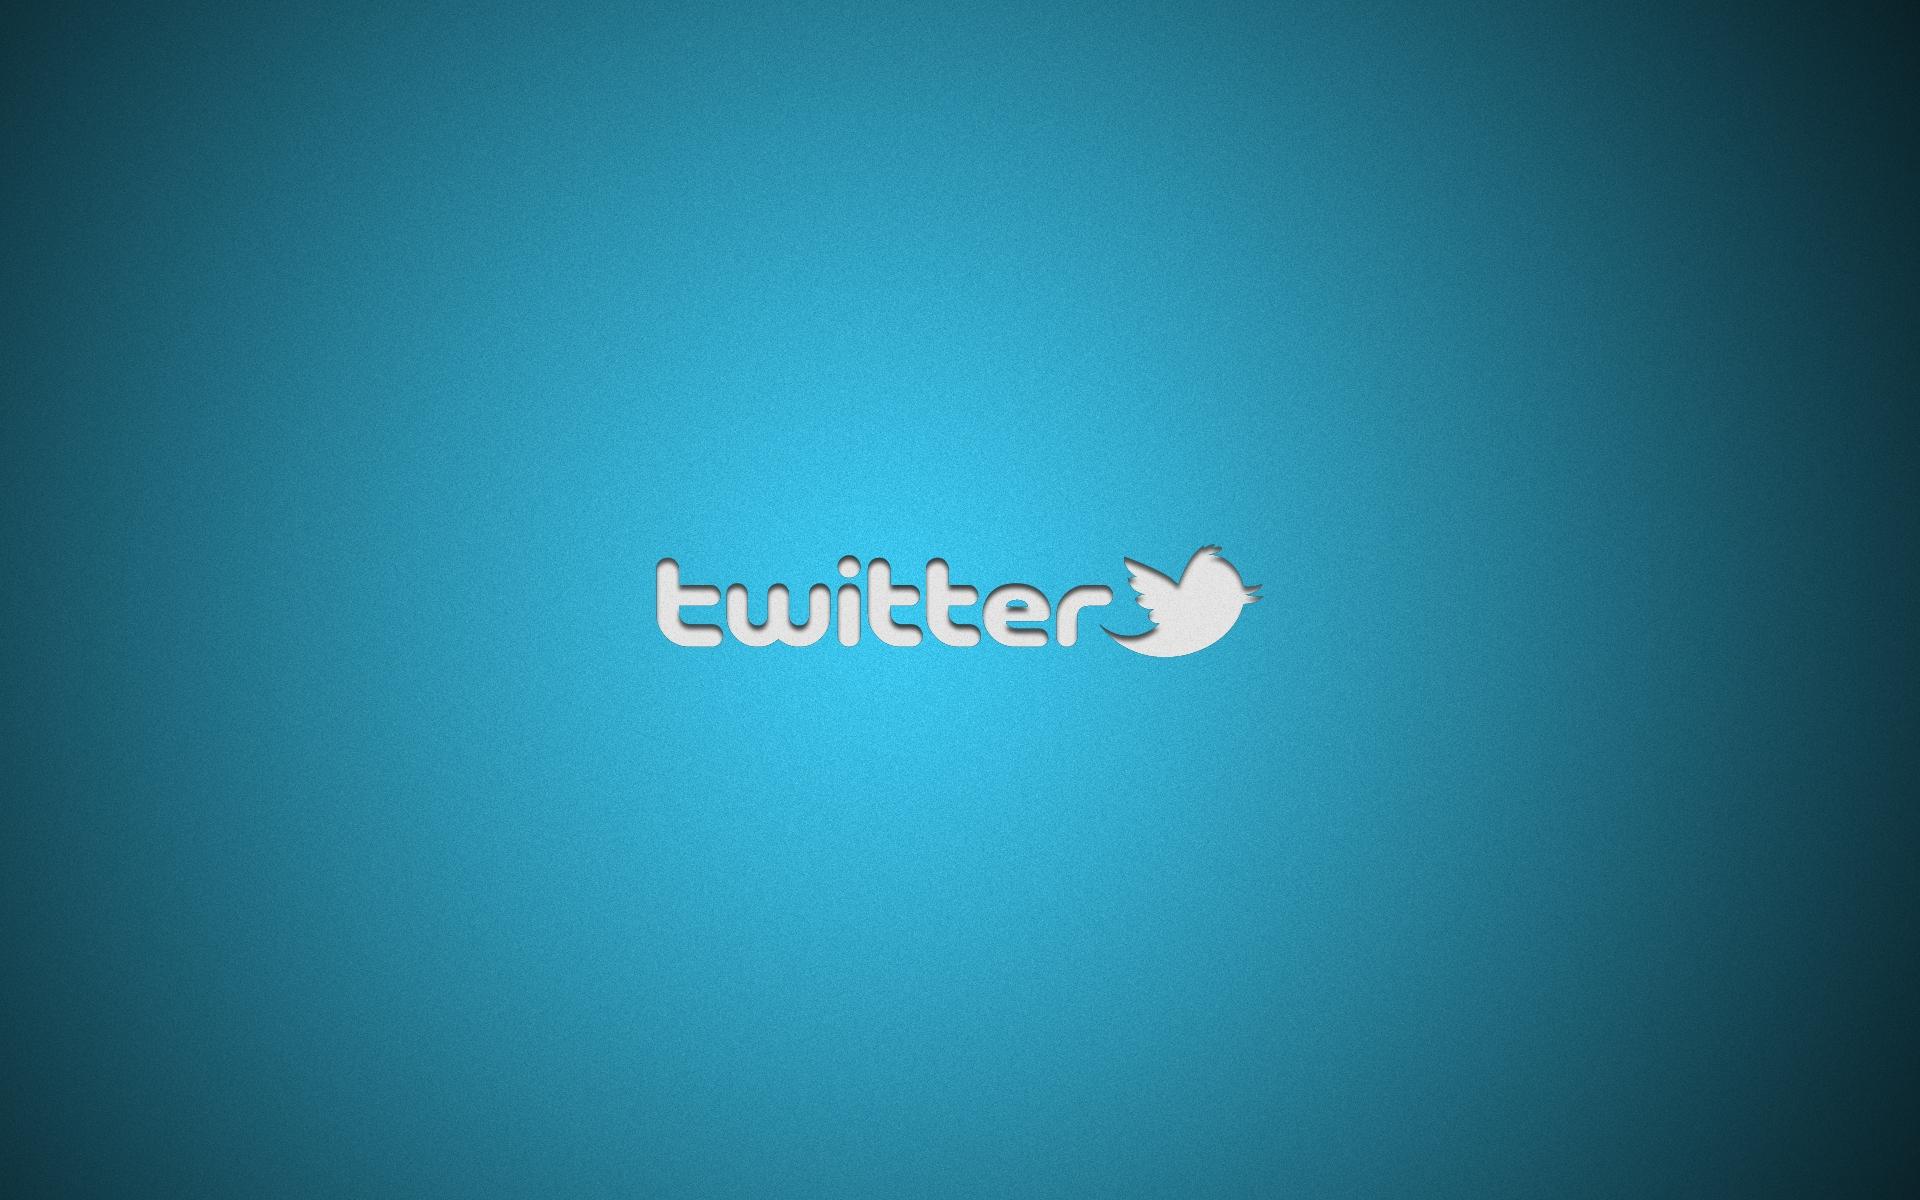 logo twitter sfondo